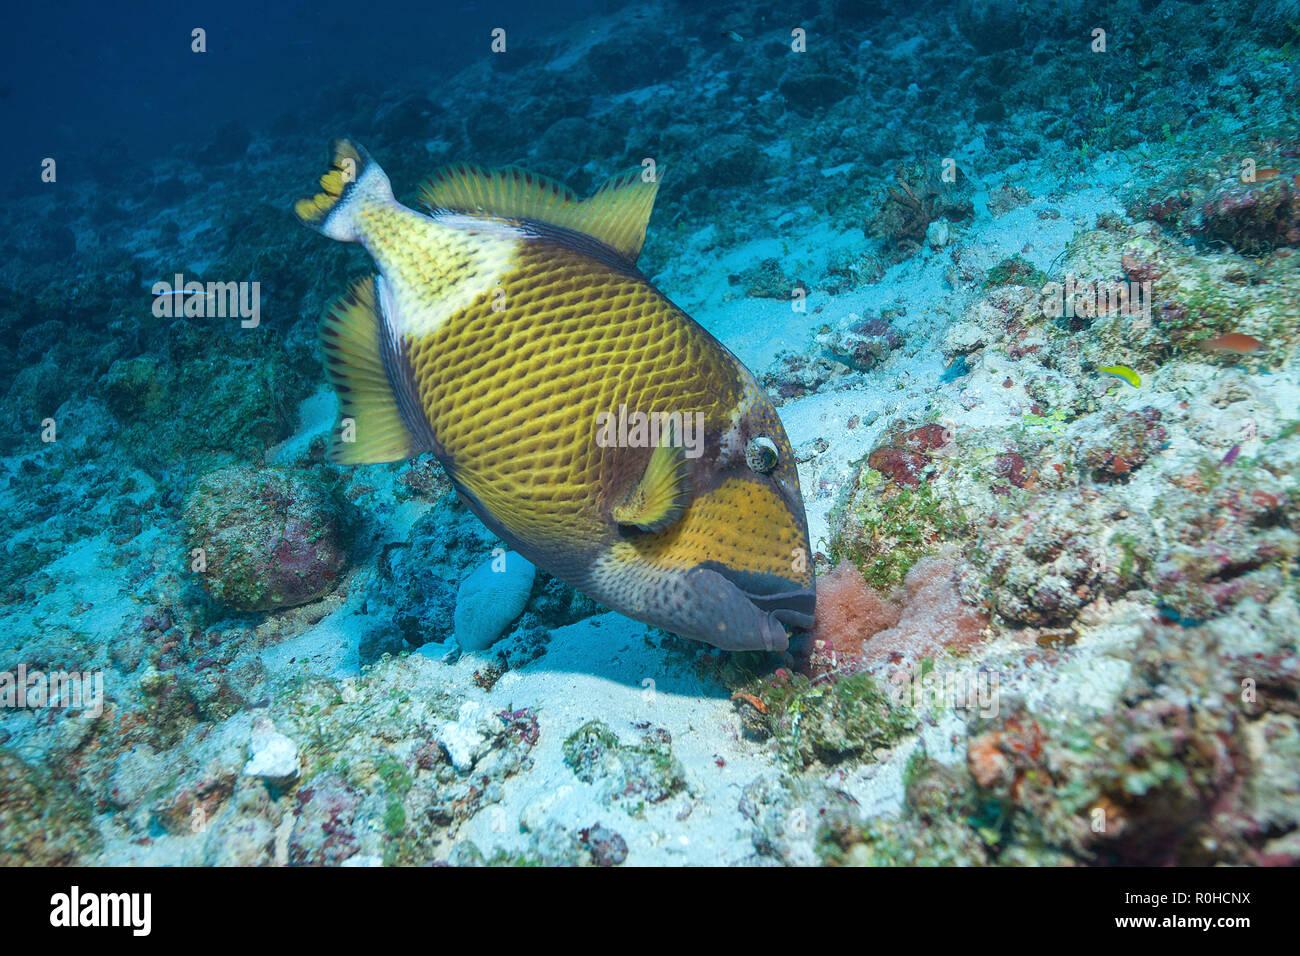 Titan triggerfish (Balistoides viridescens) at a coral reef, Ari Atoll, Maledive islands - Stock Image